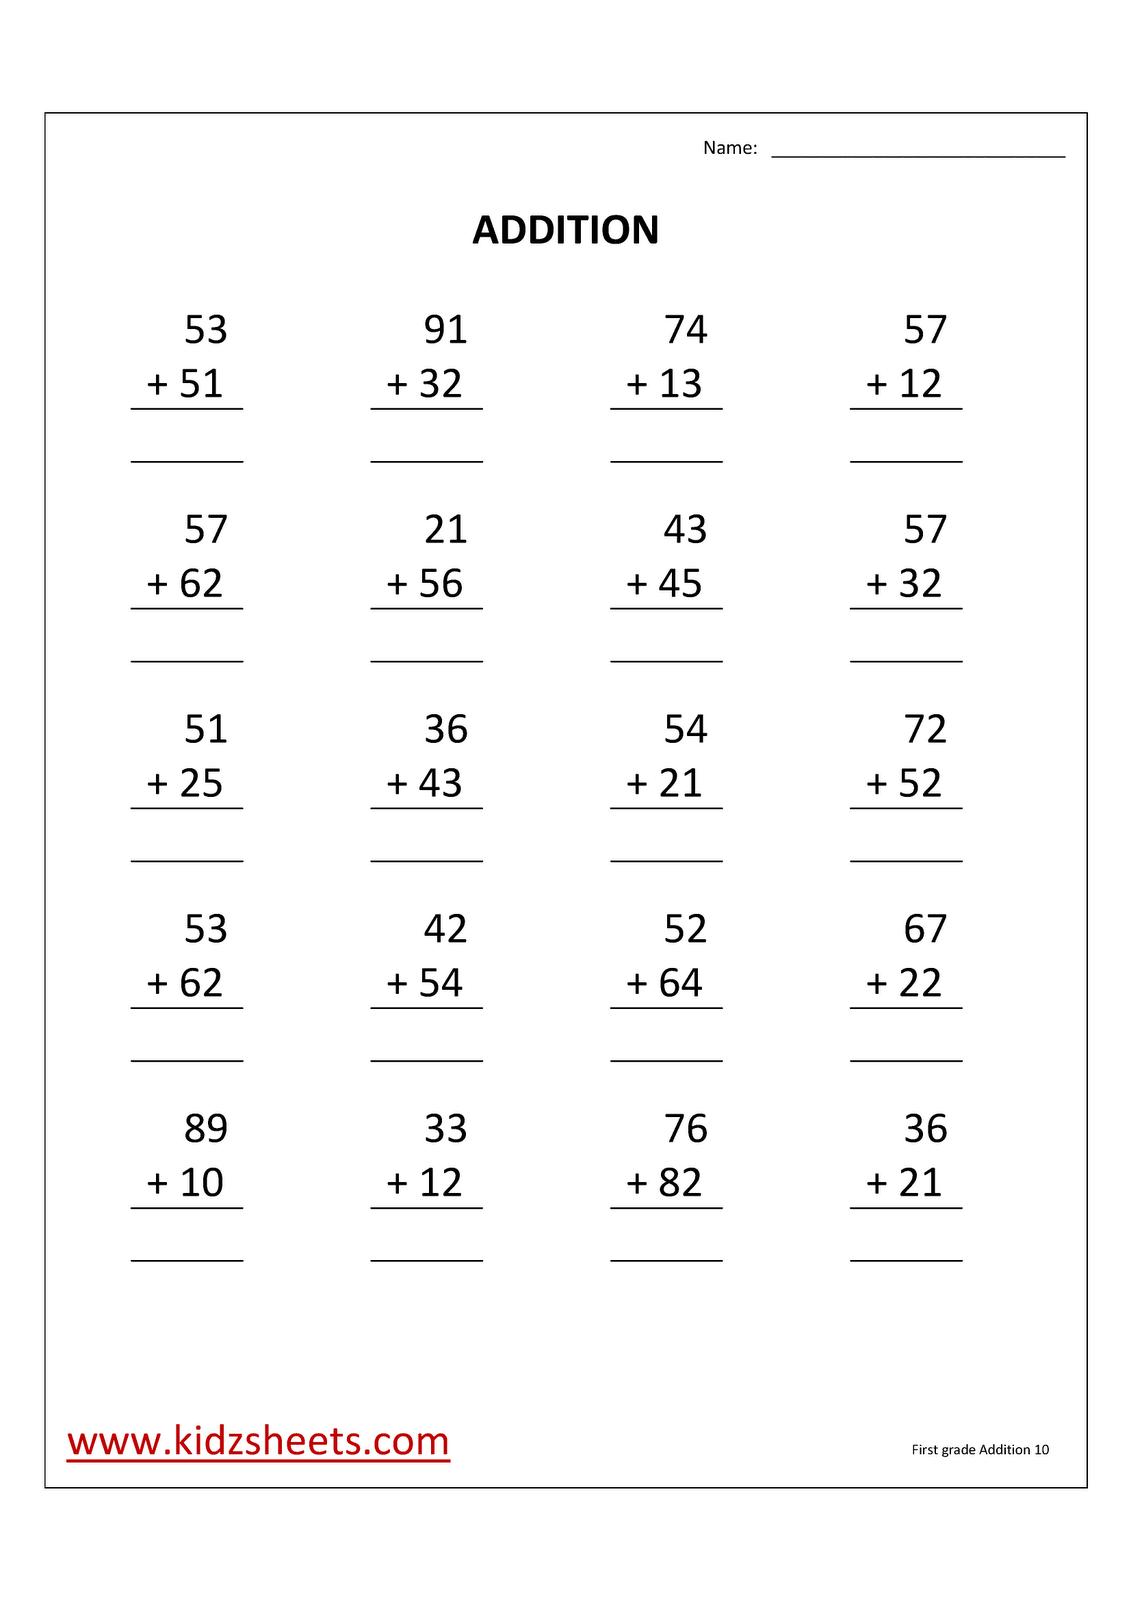 hight resolution of Kidz Worksheets: First Grade Addition Worksheet10